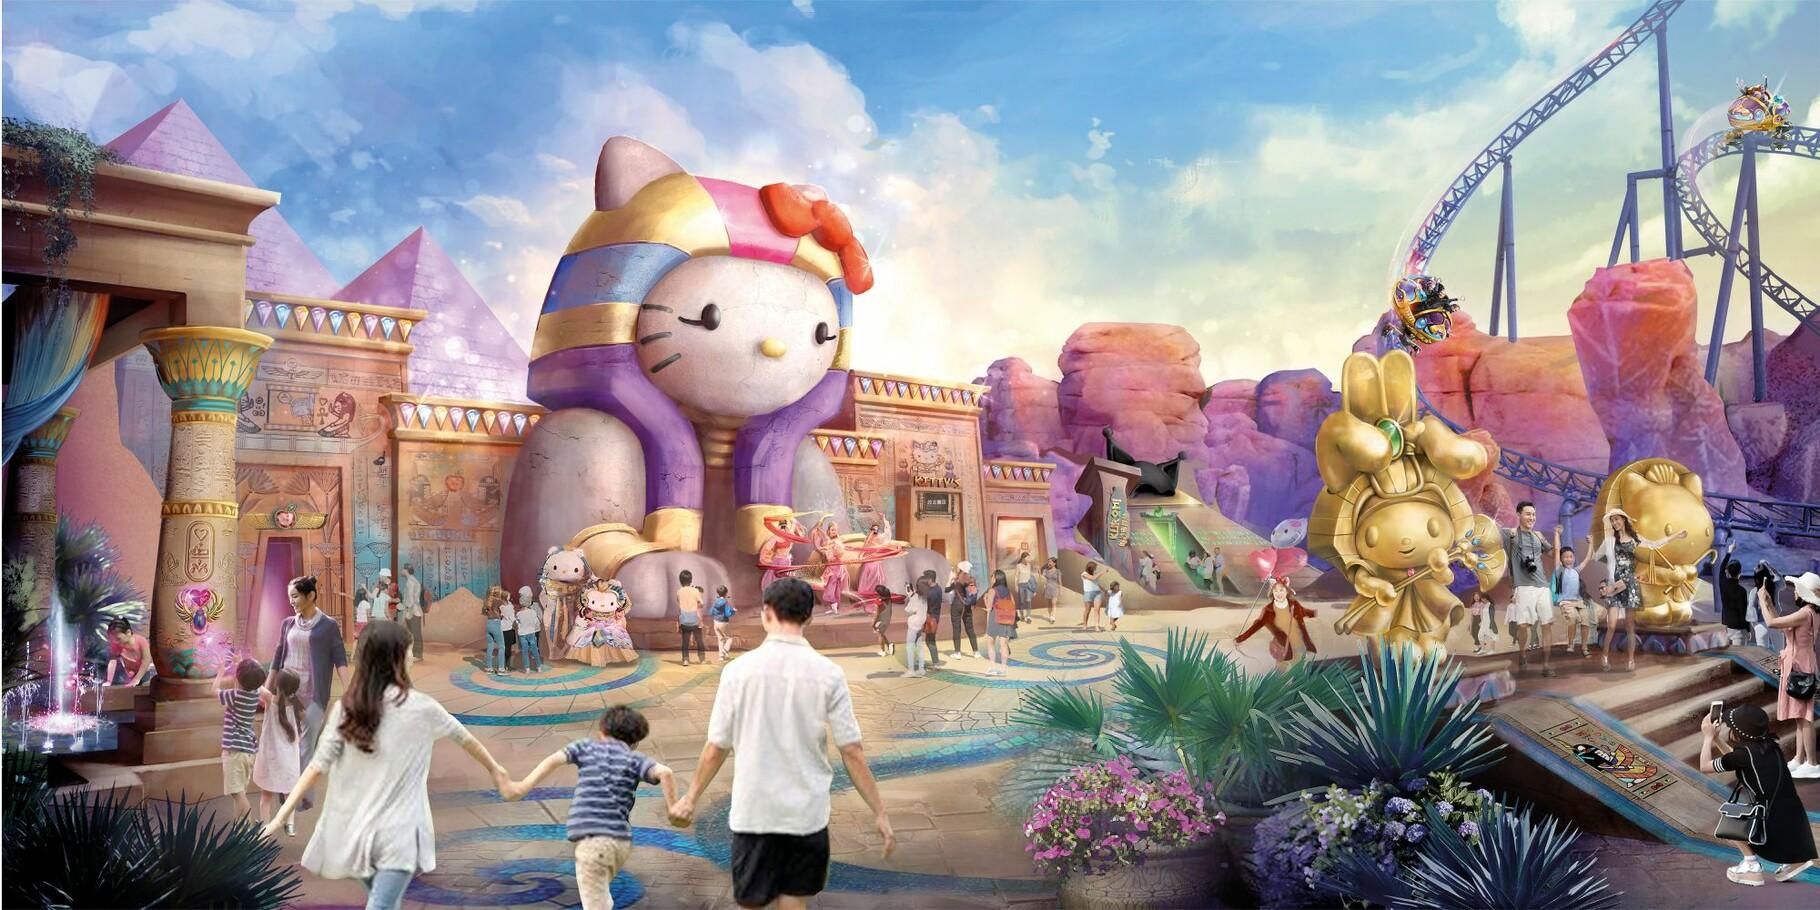 sanya-hello-kitty-theme-park-03765200.jpg